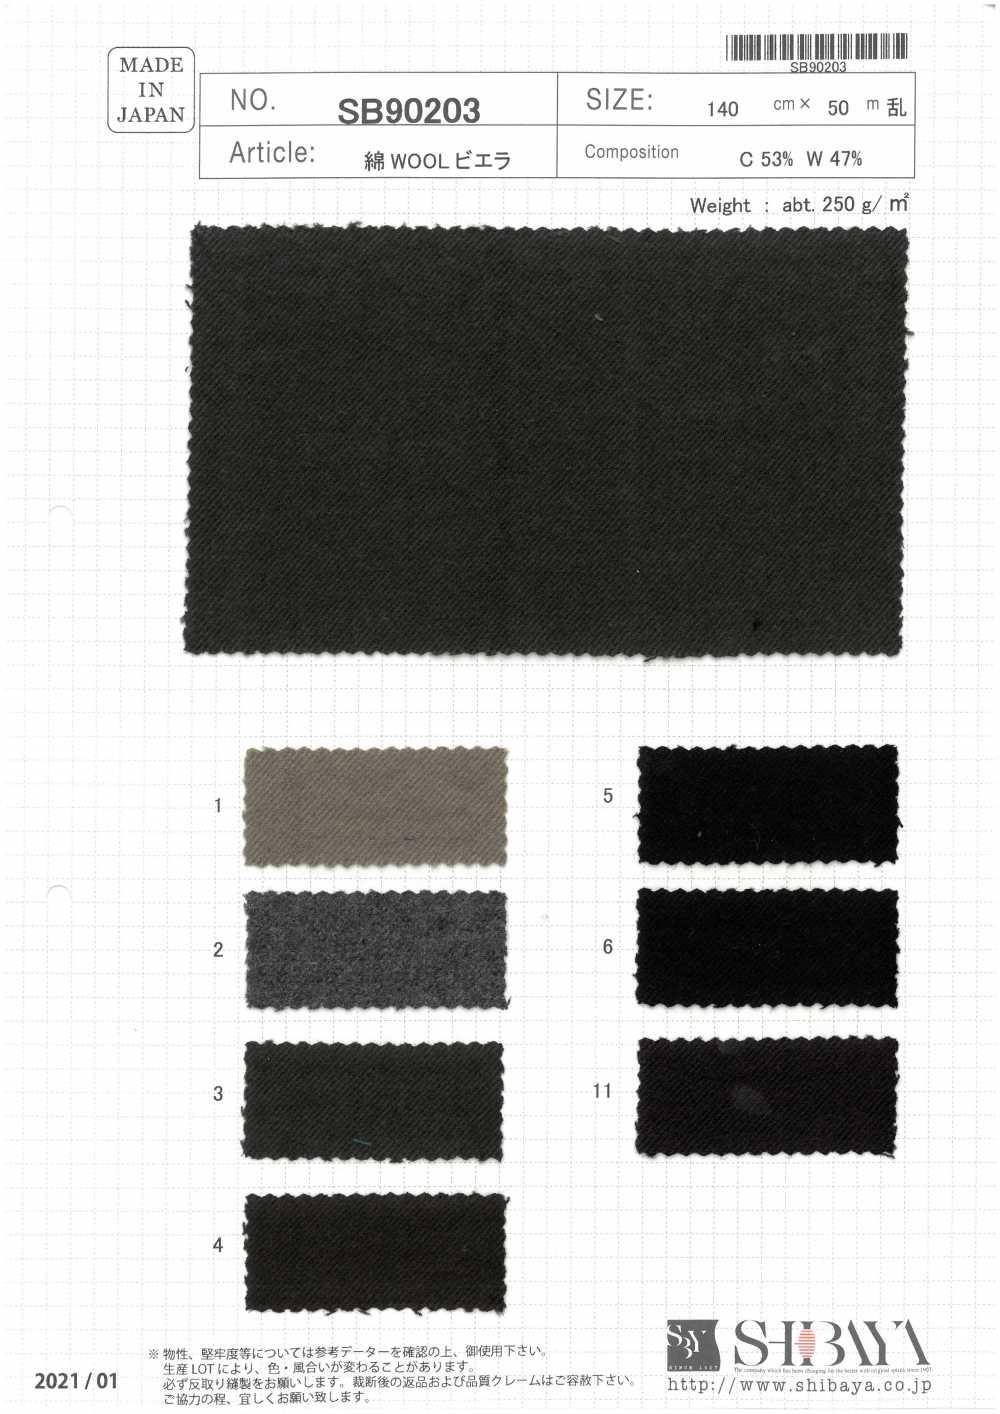 SB90203 綿ウールビエラ[生地] 柴屋/オークラ商事 - ApparelX アパレル資材卸通販